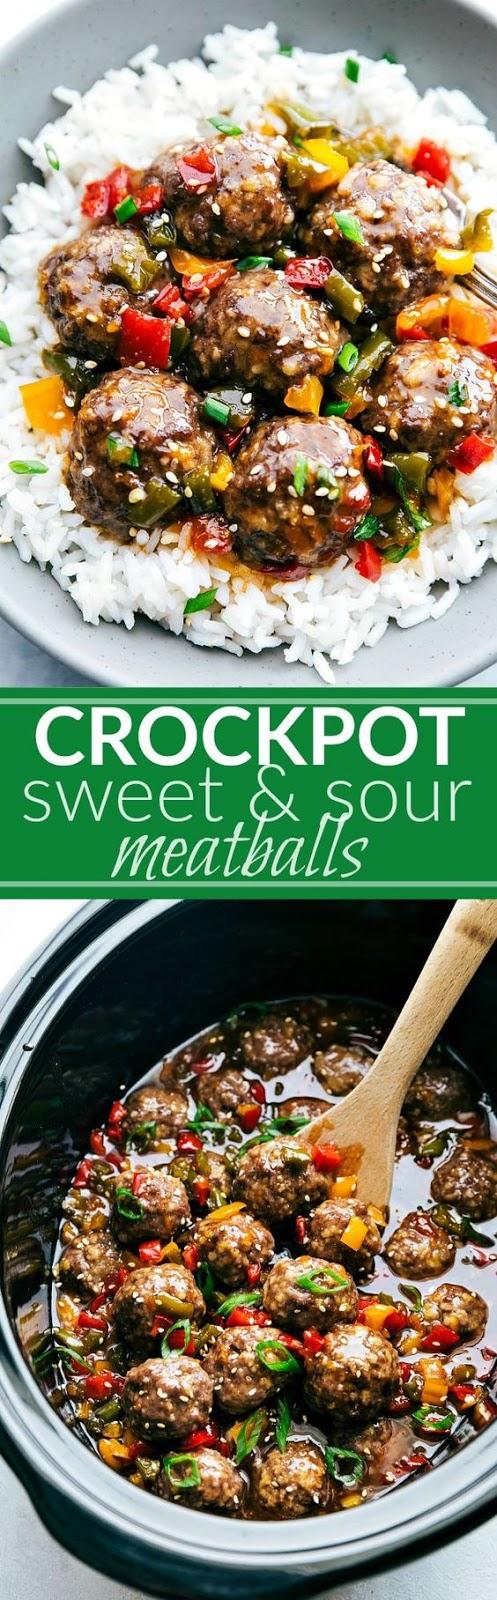 Crockpot Sweet & Sour Meatballs